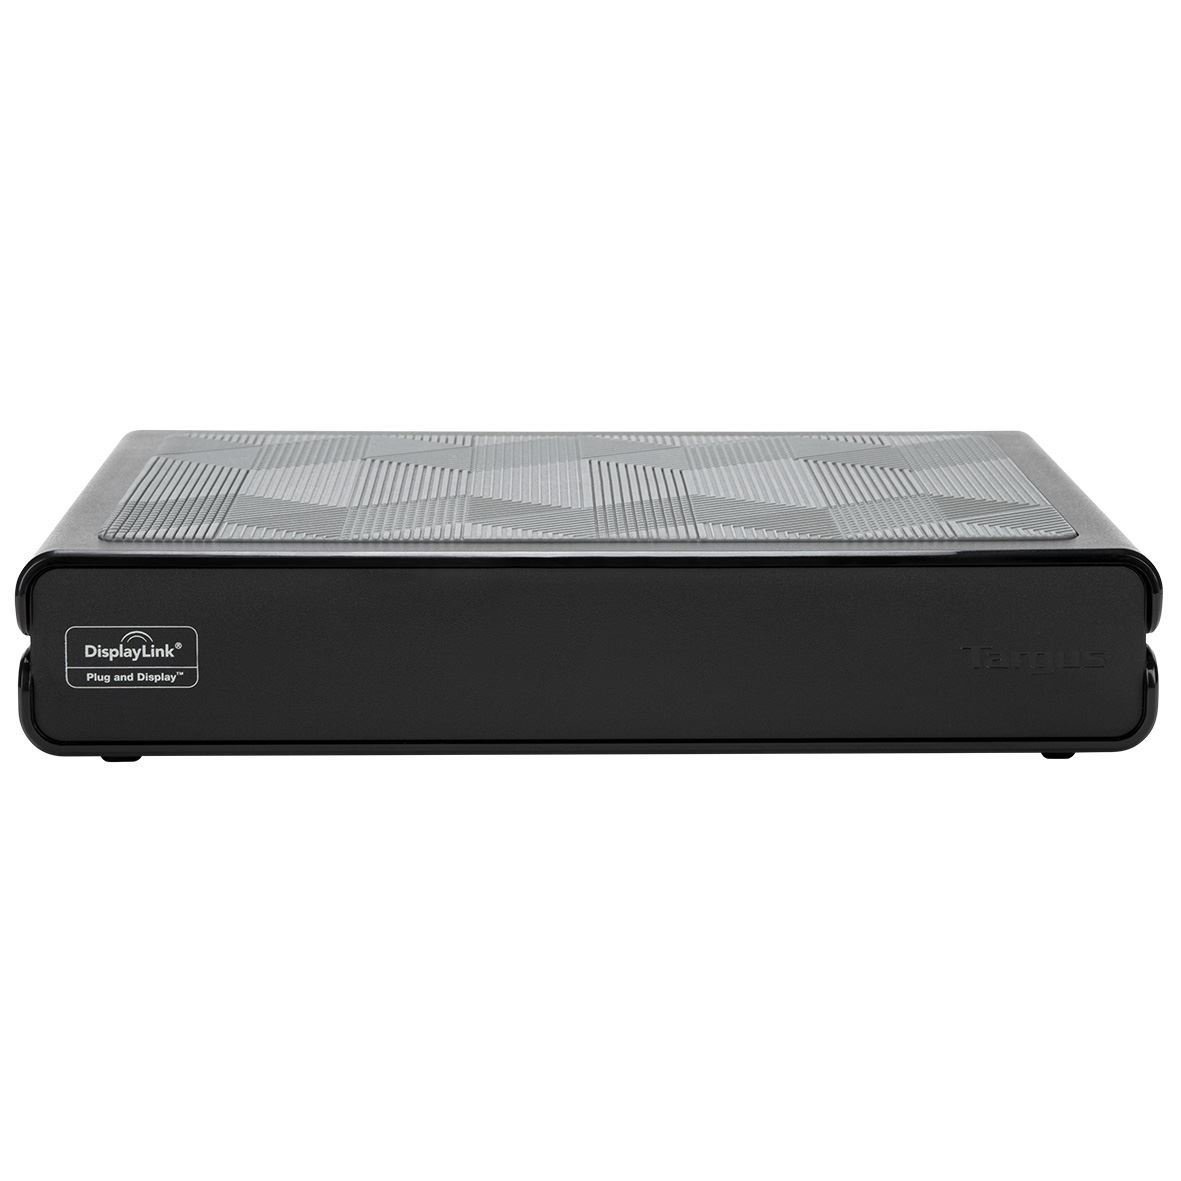 Targus Universal Docking Station With Laptop Power USB-A 3.0 SV 2K DV 1K Video DOCK171EUZ - Black (Replaces ACP71EUZ)